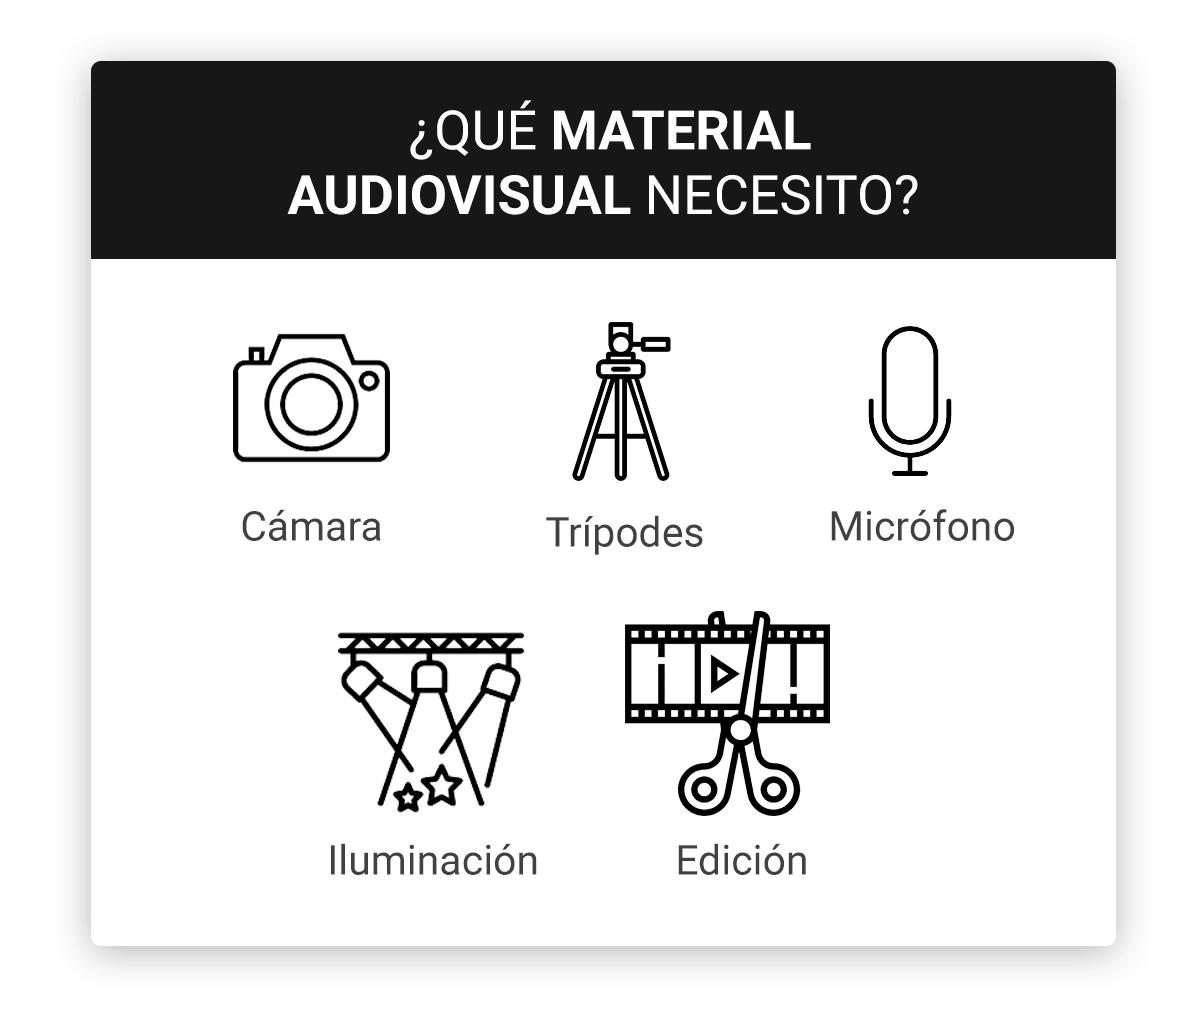 que-material-audiovisual-necesito-min